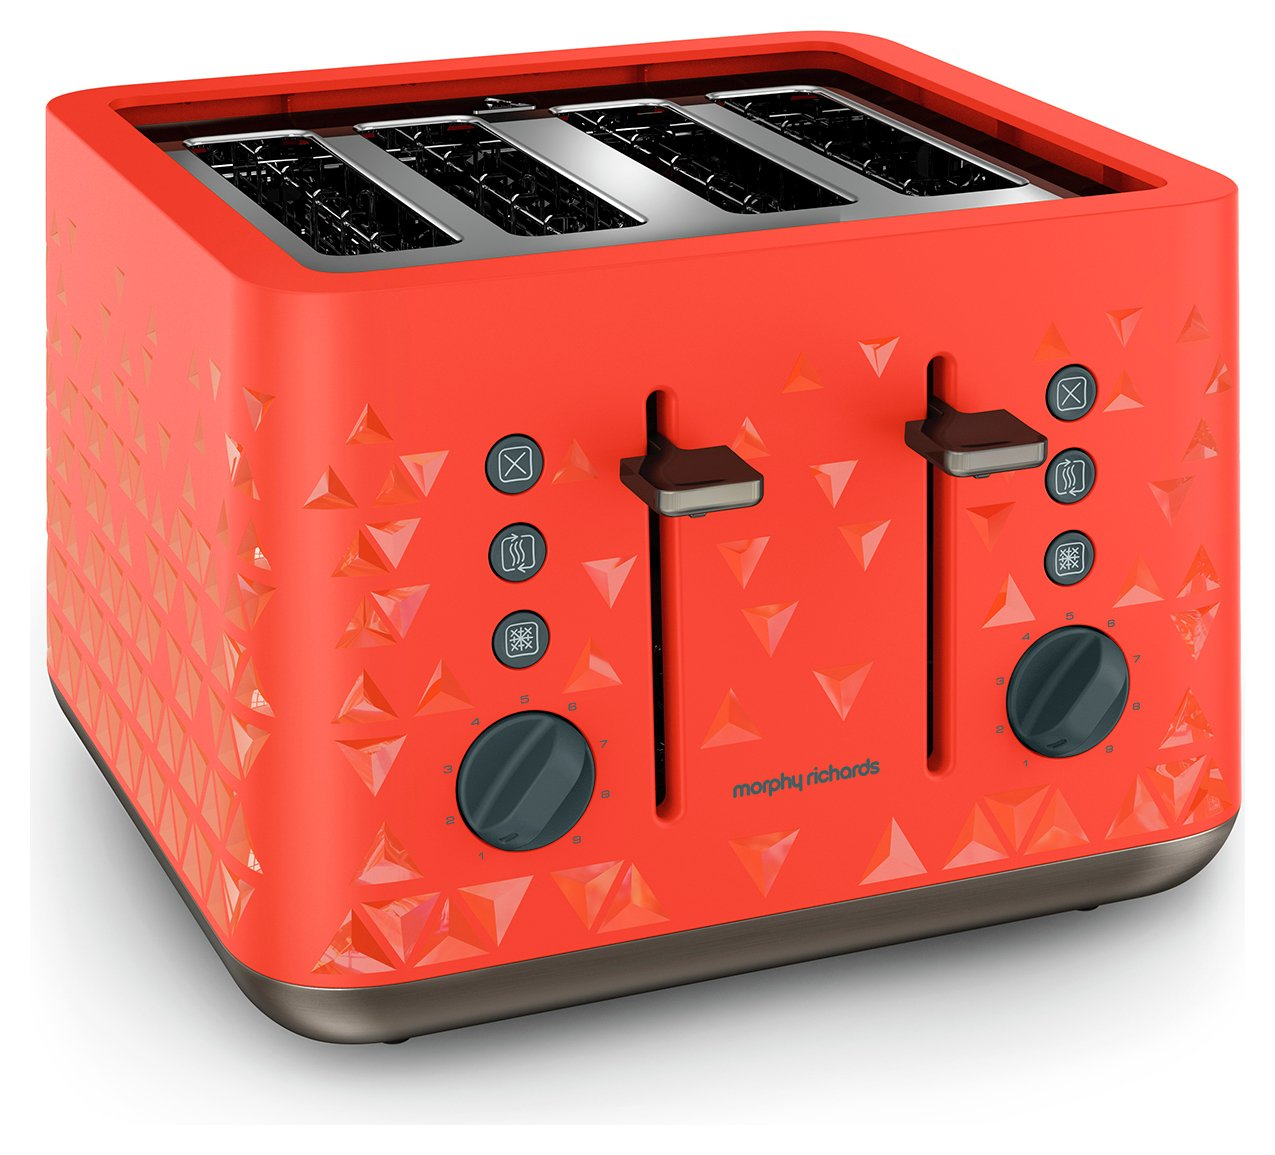 Morphy Richards - Toaster - Prism Toaster - -Orange